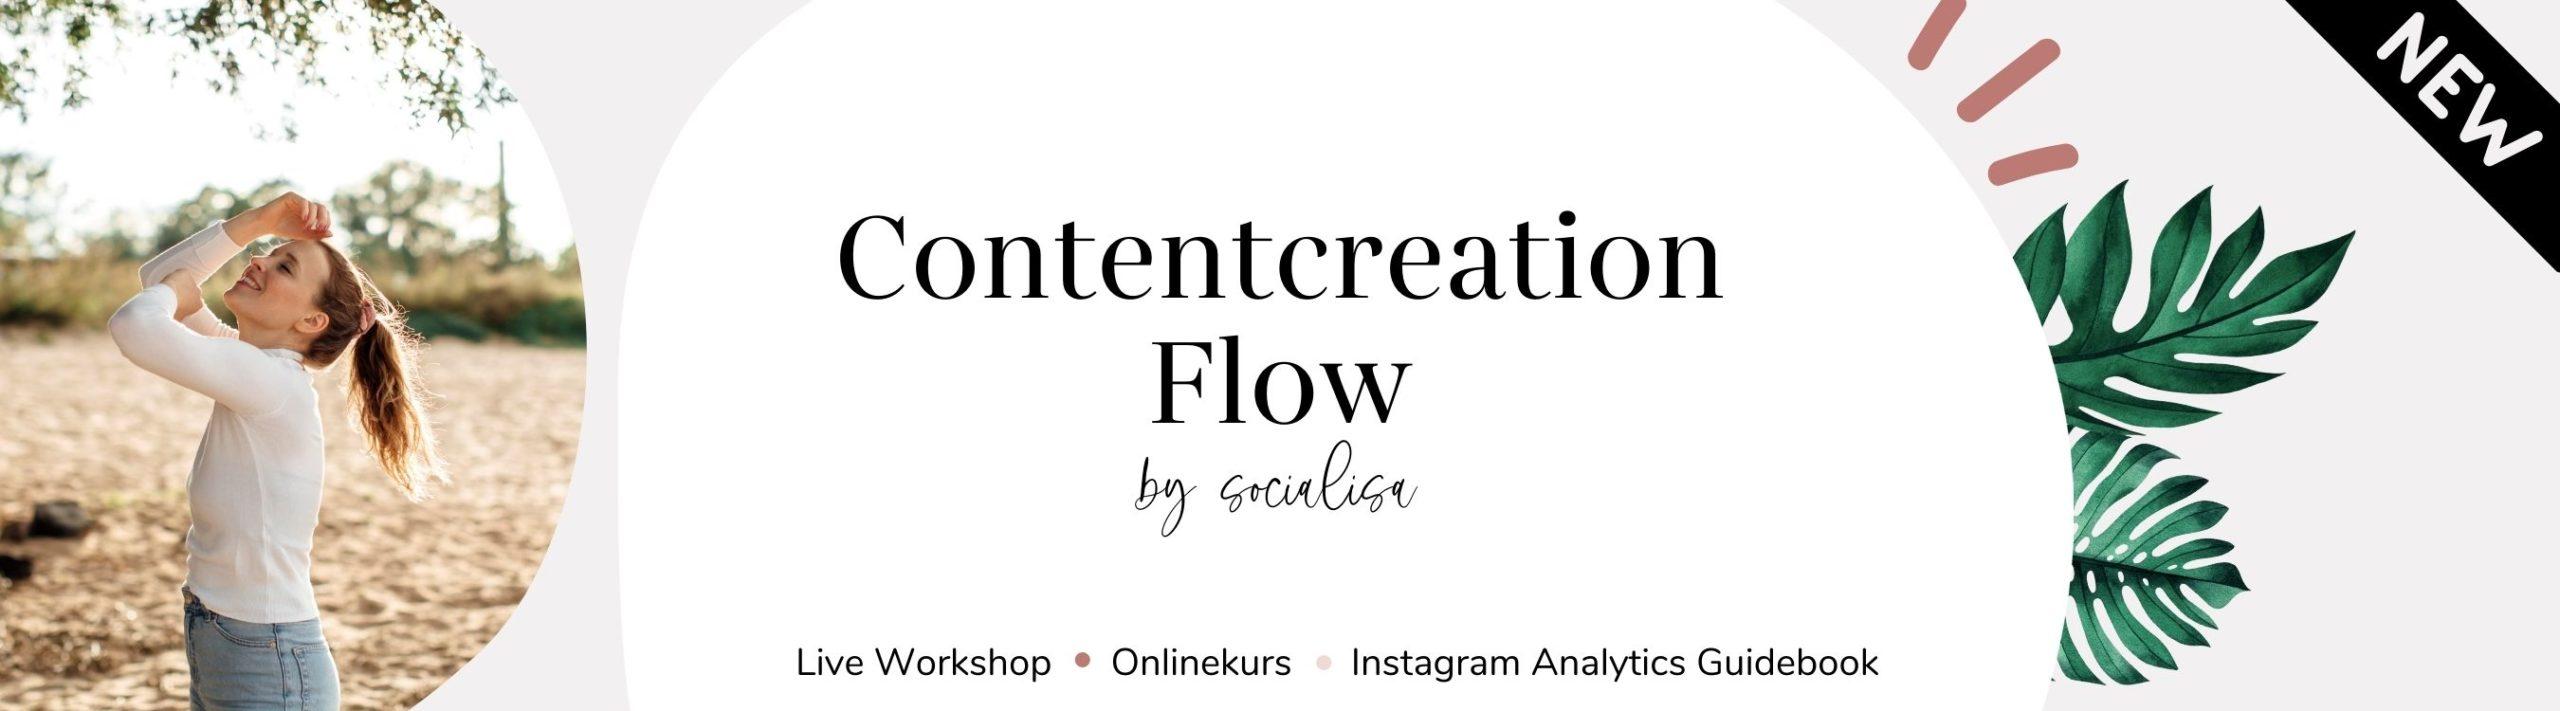 contentcreation flow header